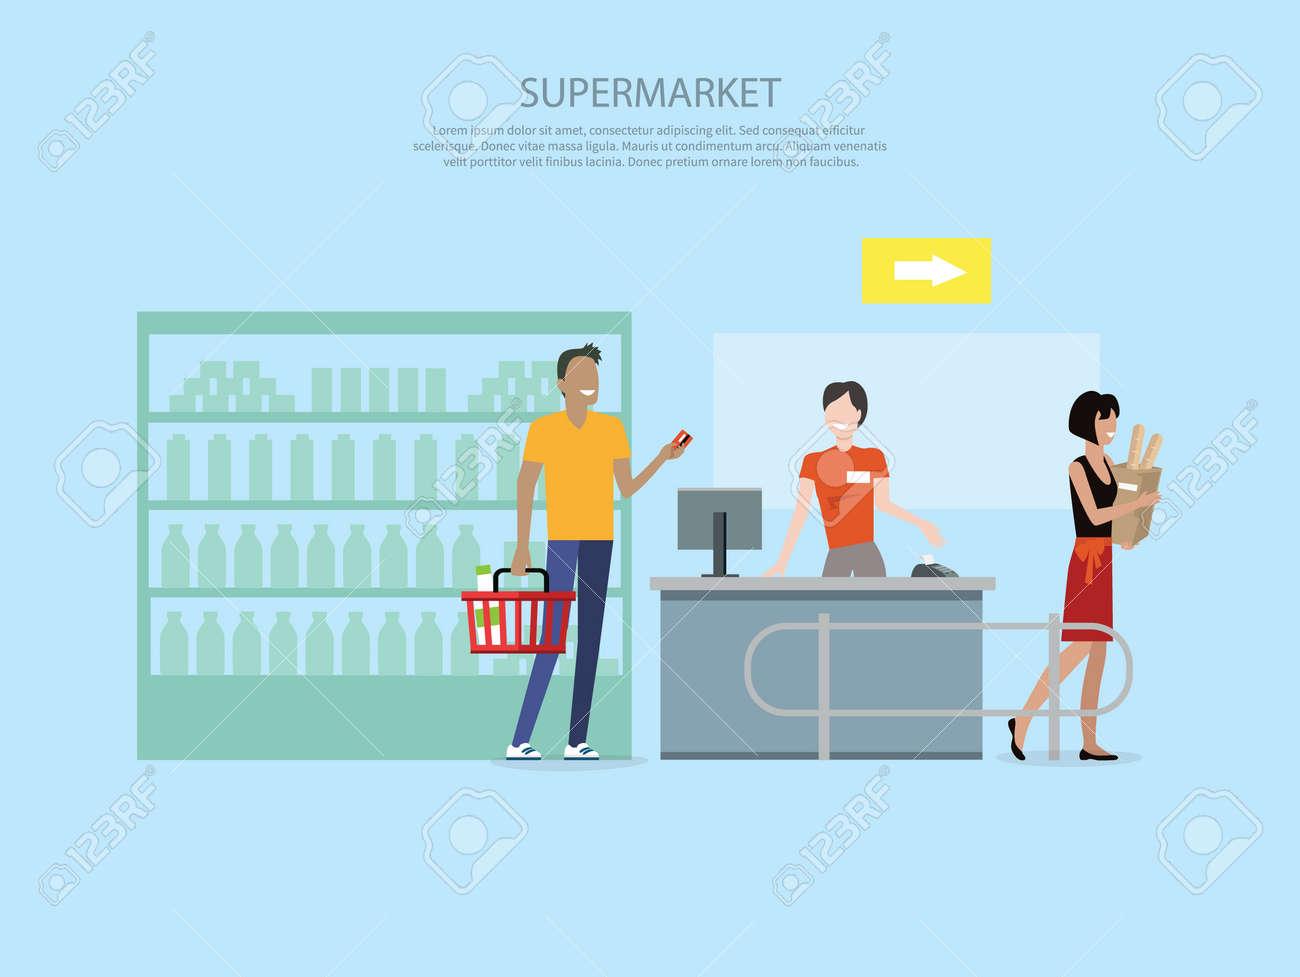 People in supermarket interior design. People shopping, supermarket shopping, marketing people, market shop interior, customer in mall, retail store illustration Foto de archivo - 51594031